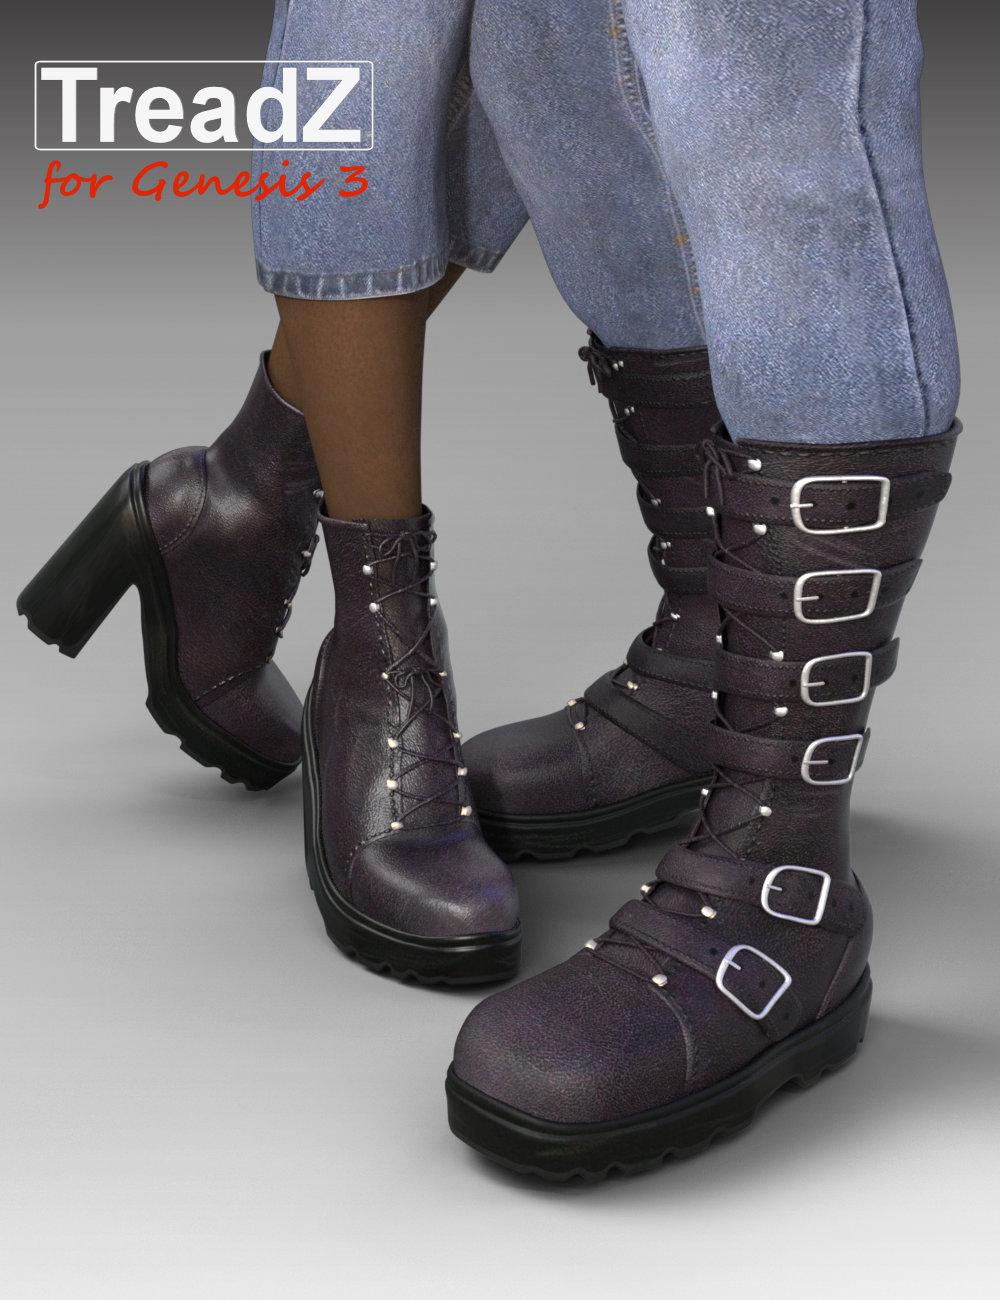 TreadZ for Genesis 3 by: Daz Originalsthe3dwizard, 3D Models by Daz 3D